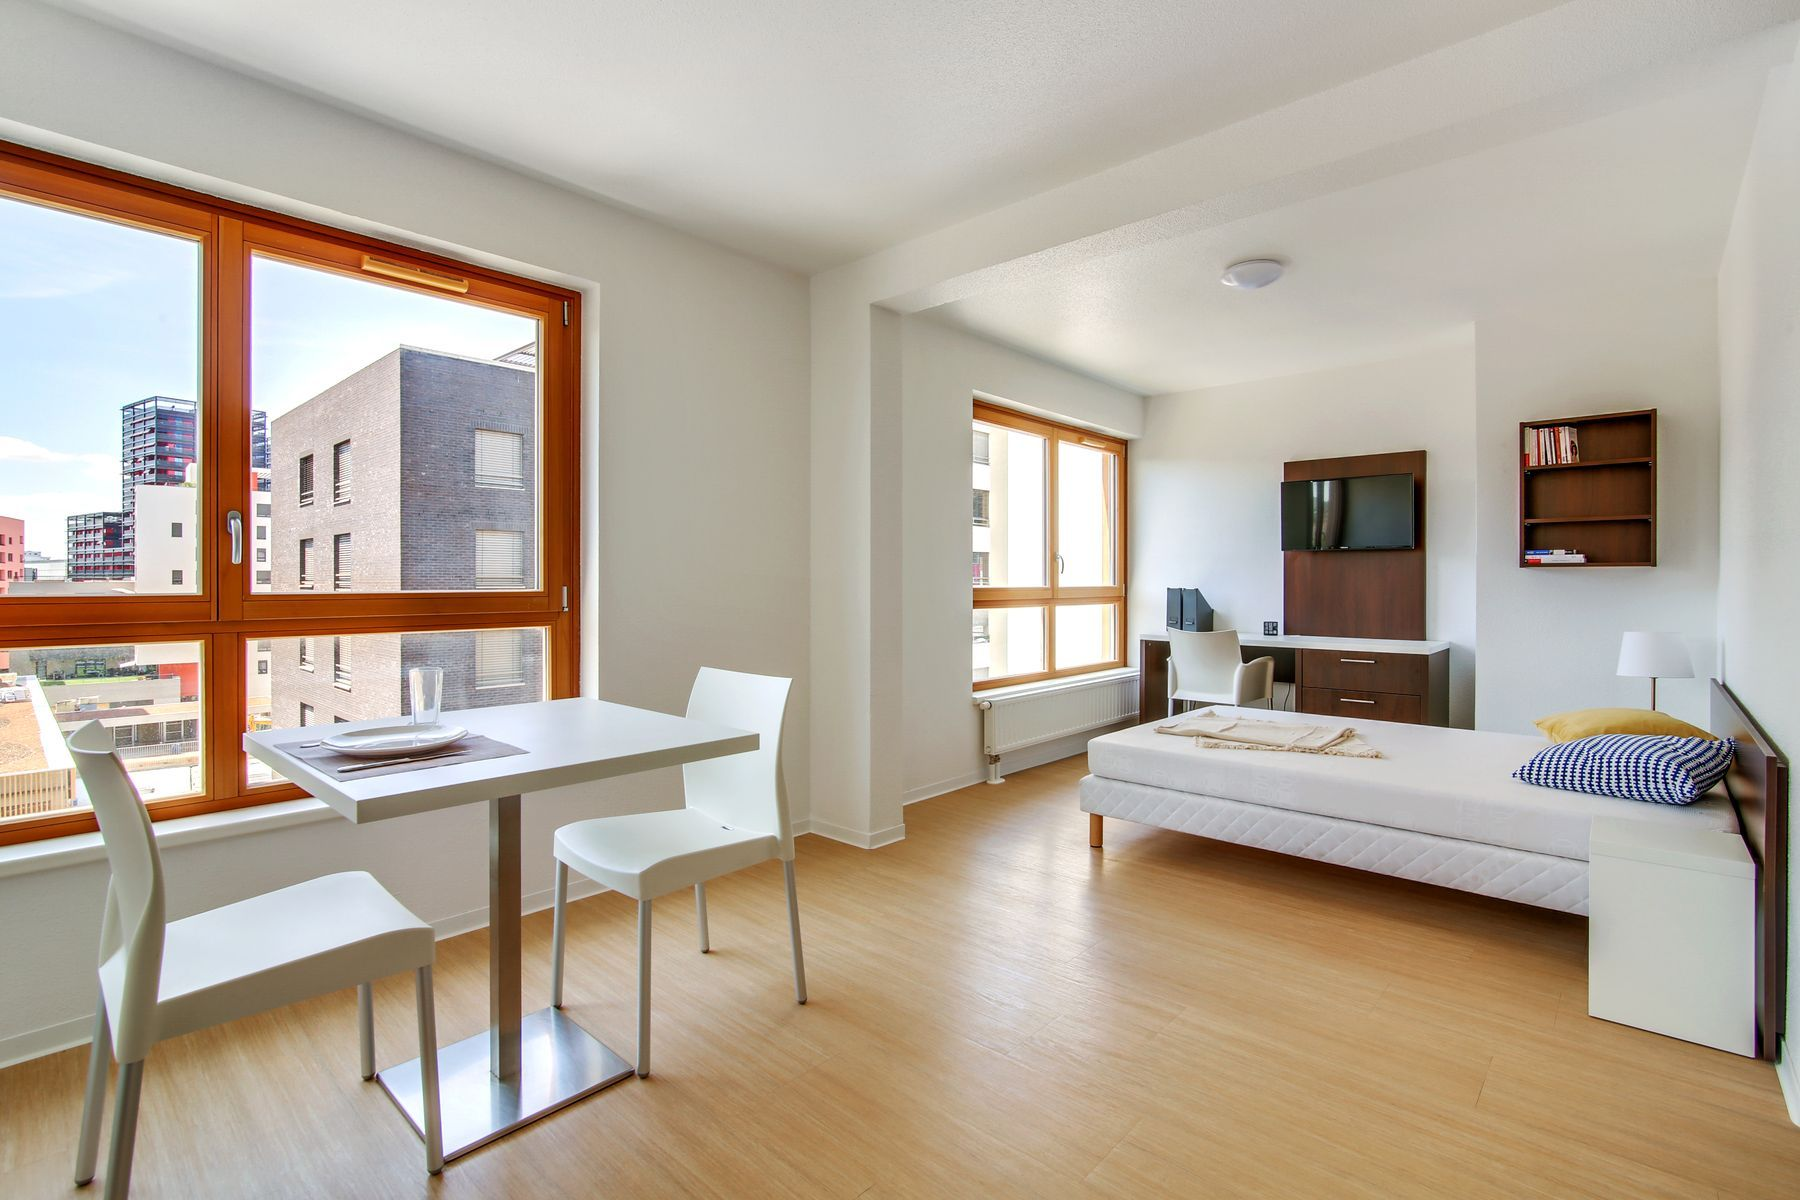 LOGIFAC résidence étudiante Kellerman Strasbourg équipé